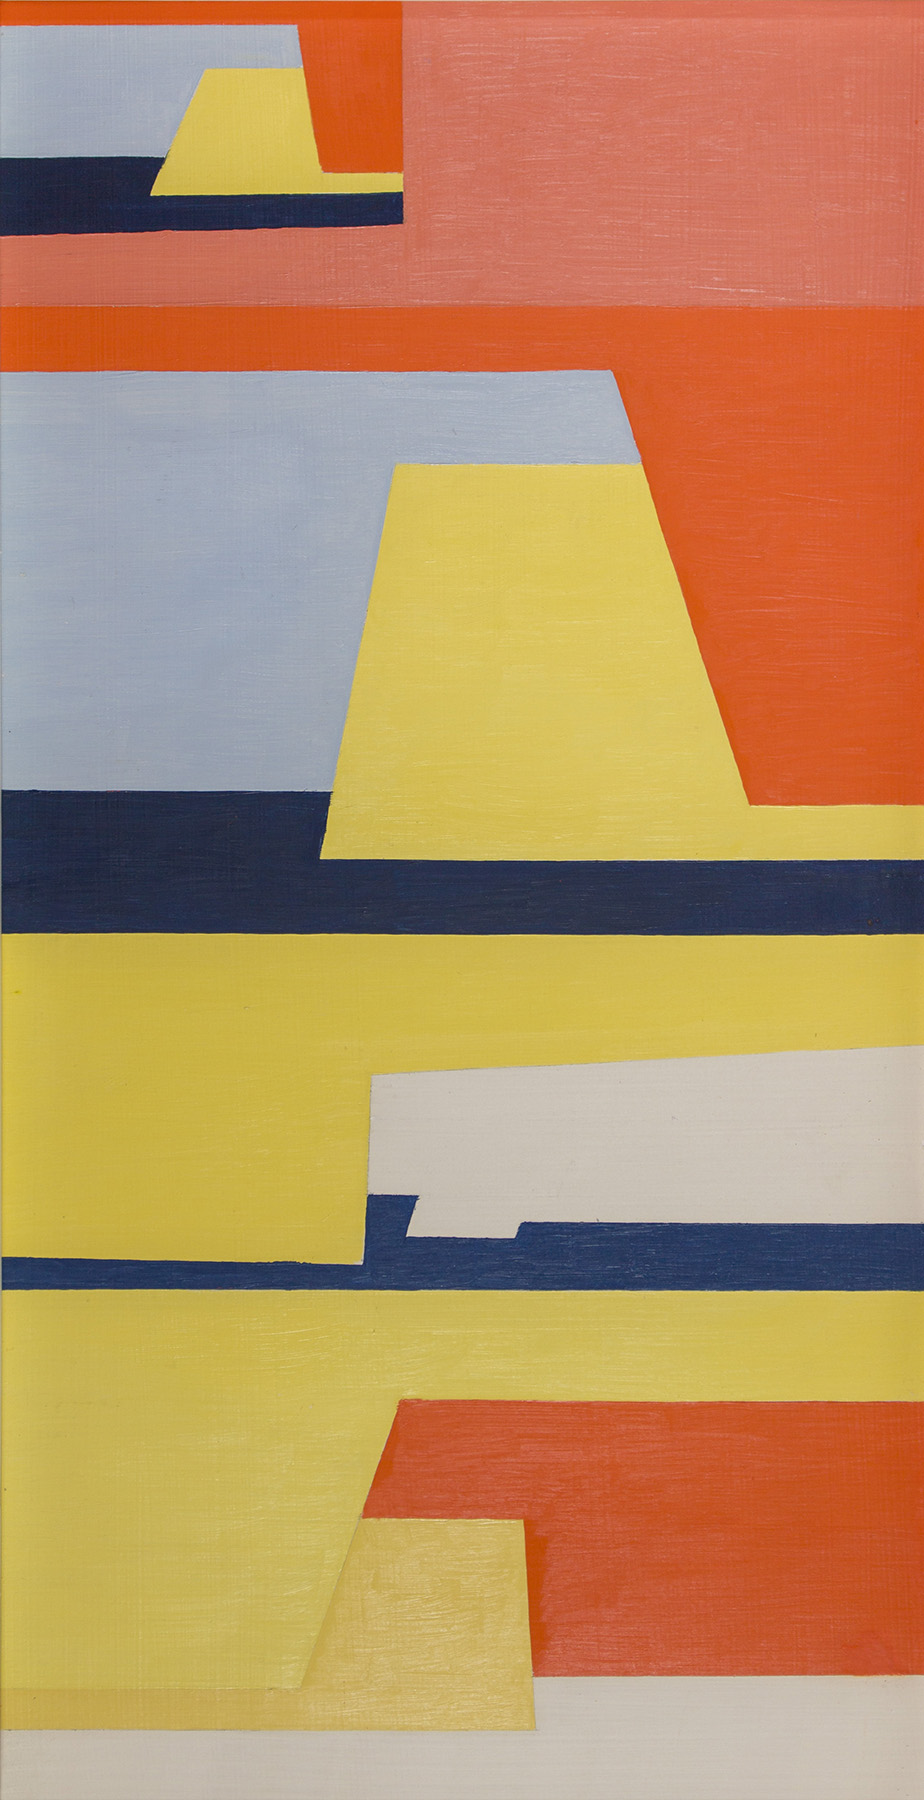 Christian Roeckenschuss | K516, 66 x 35 cm, um 1956, Holz farbig gefasst